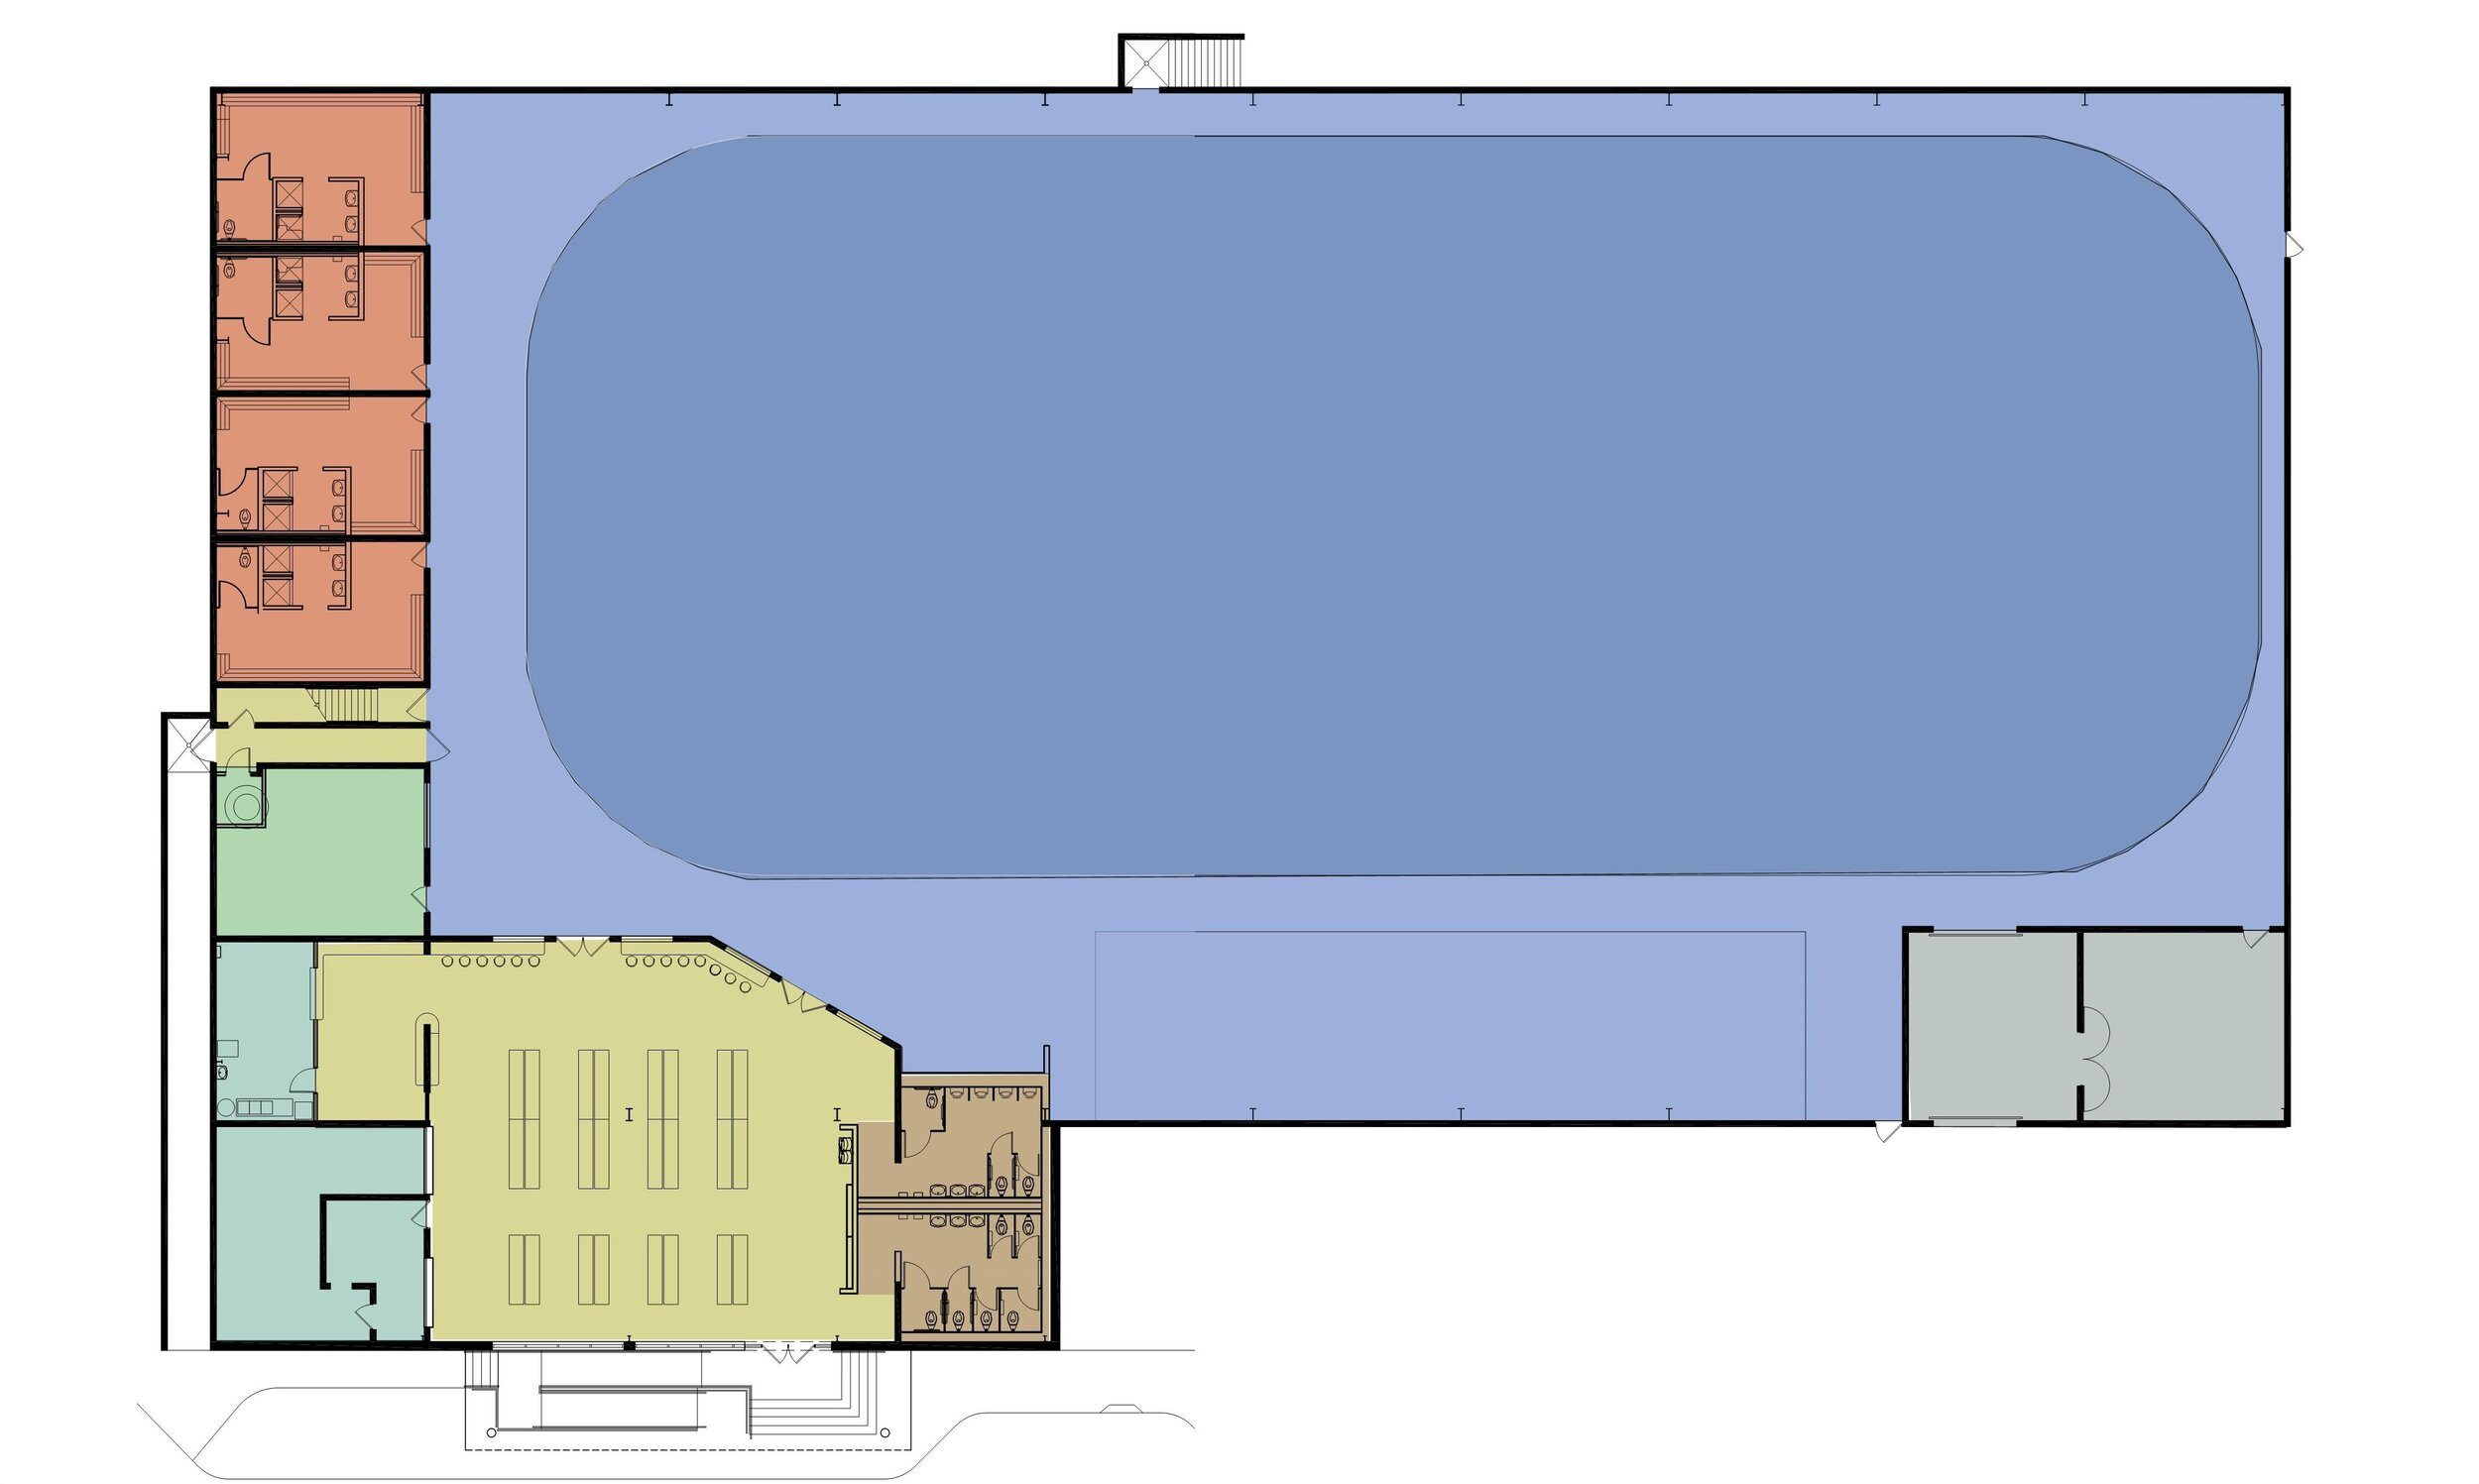 BCRP Mt. Pleasant Ice Arena Floor Plan.jpg